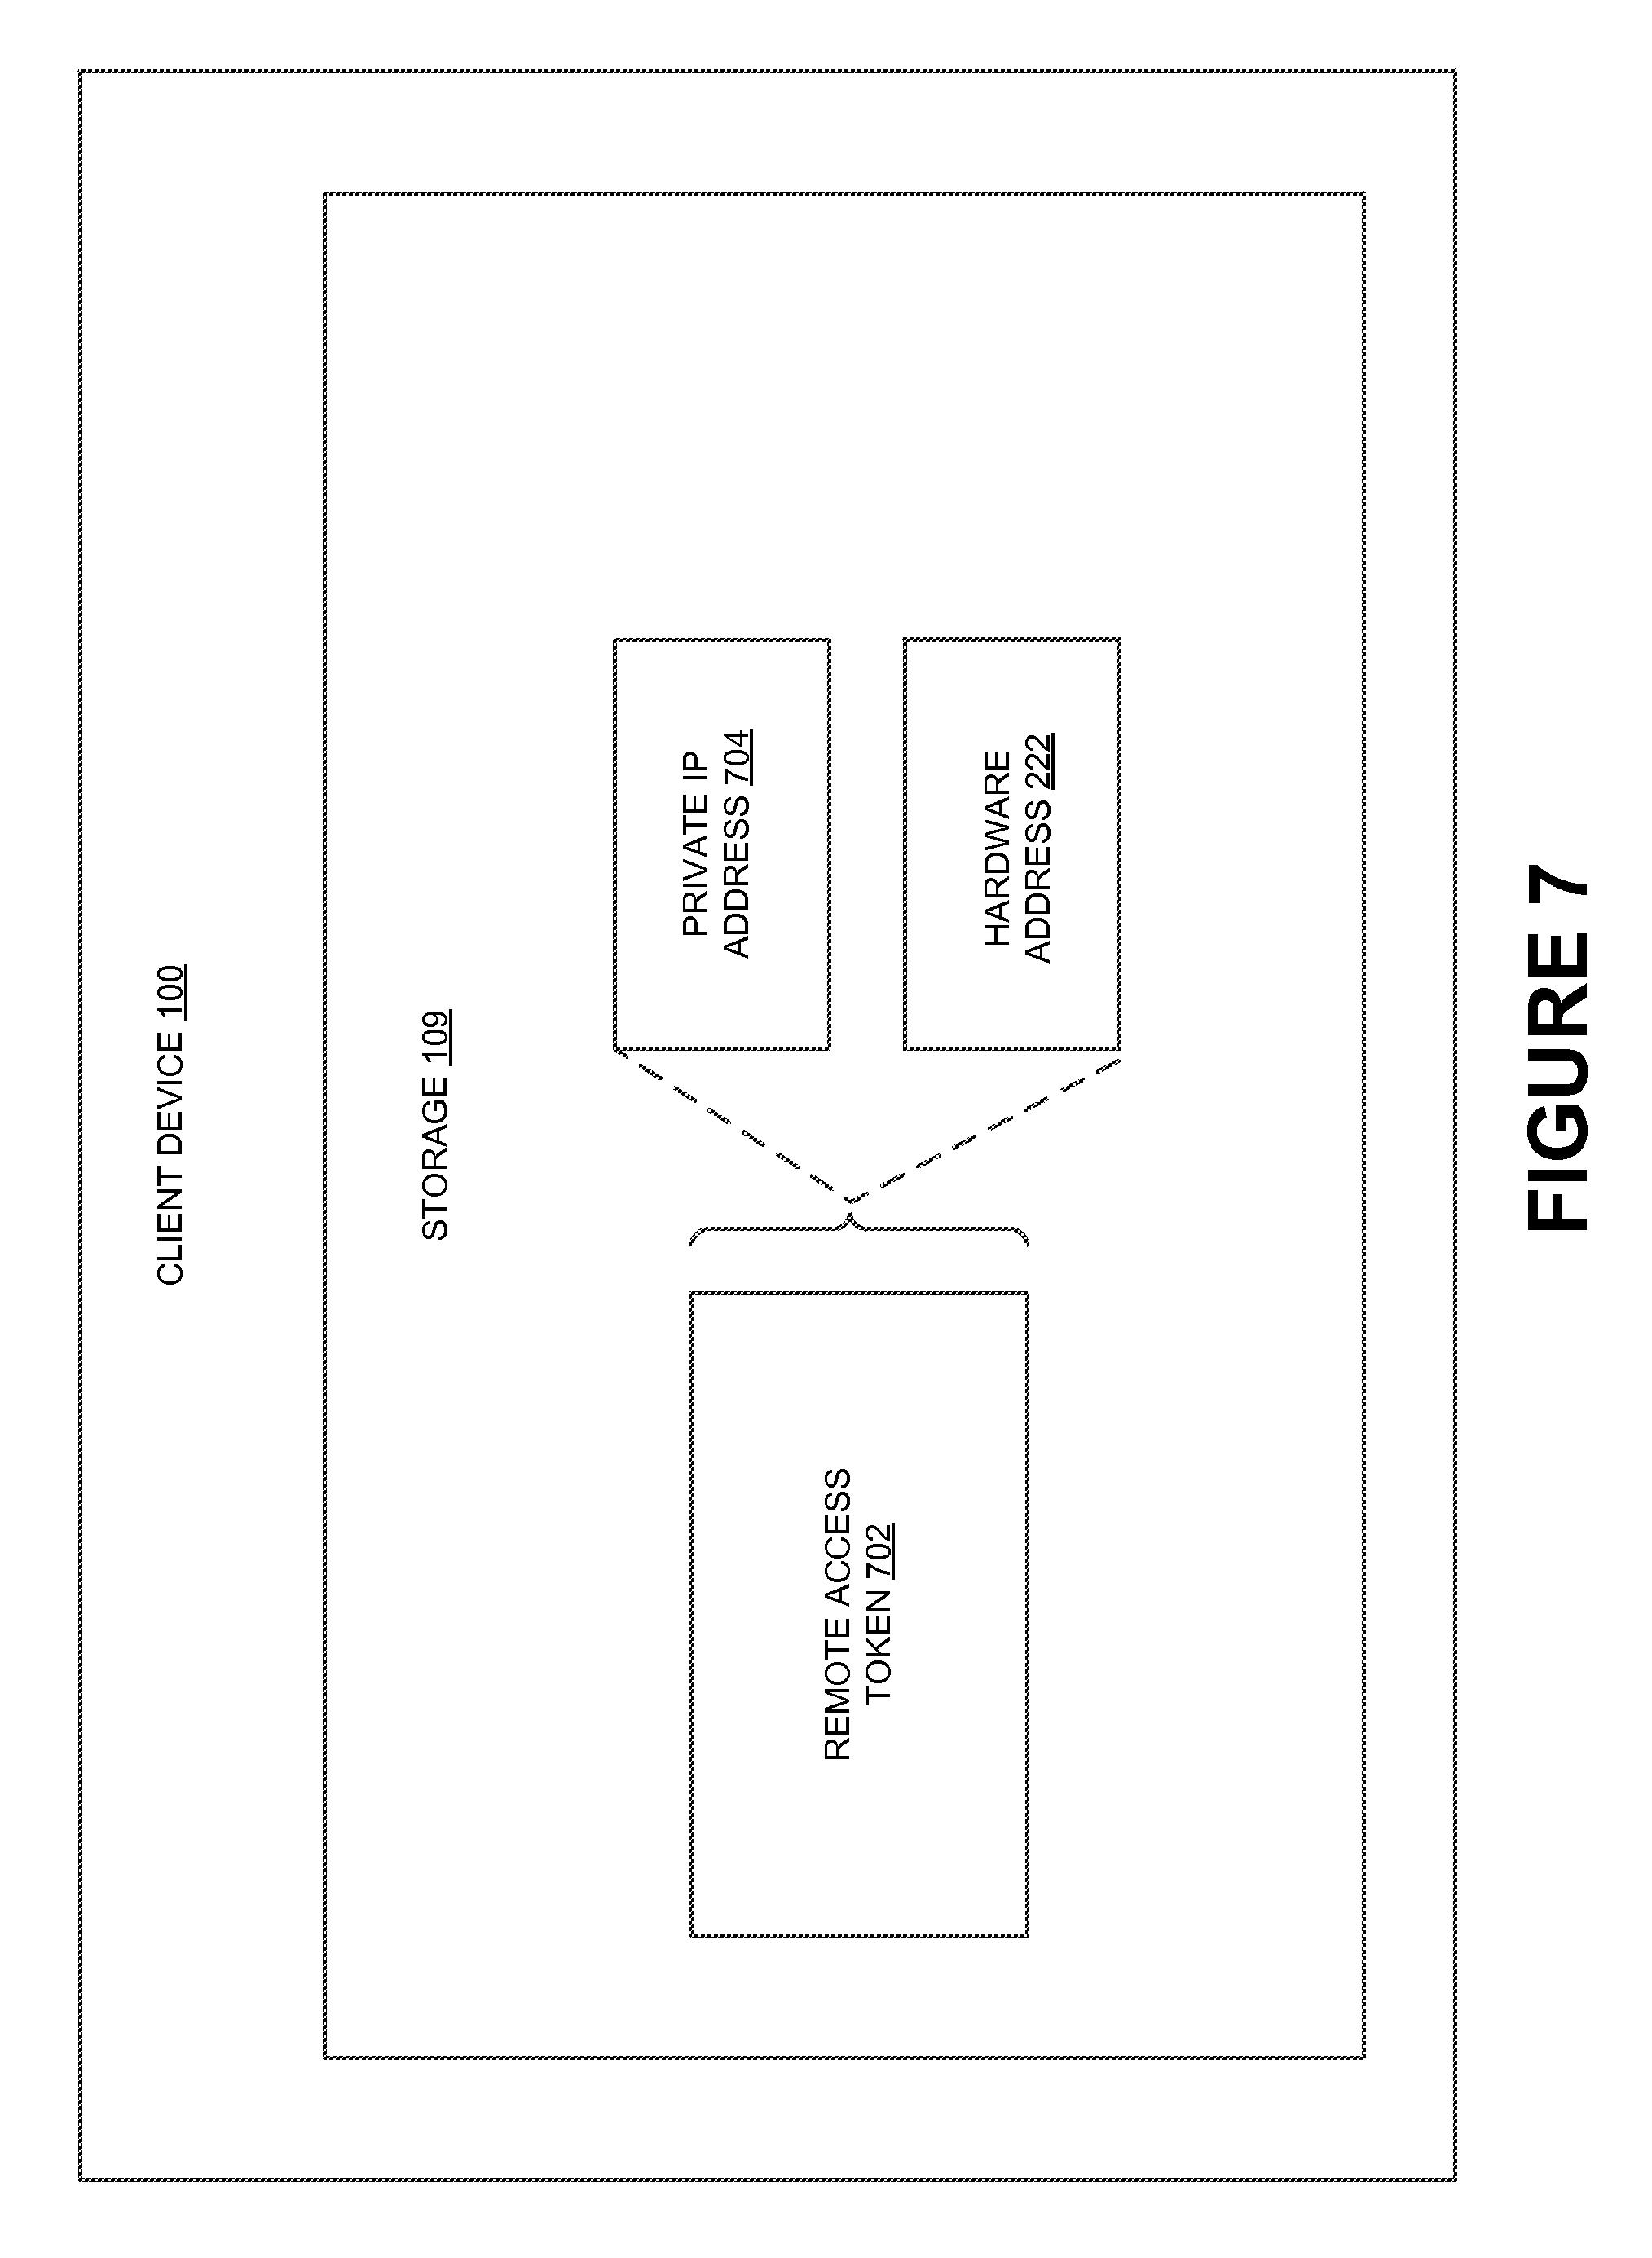 Patent US 9,154,942 B2